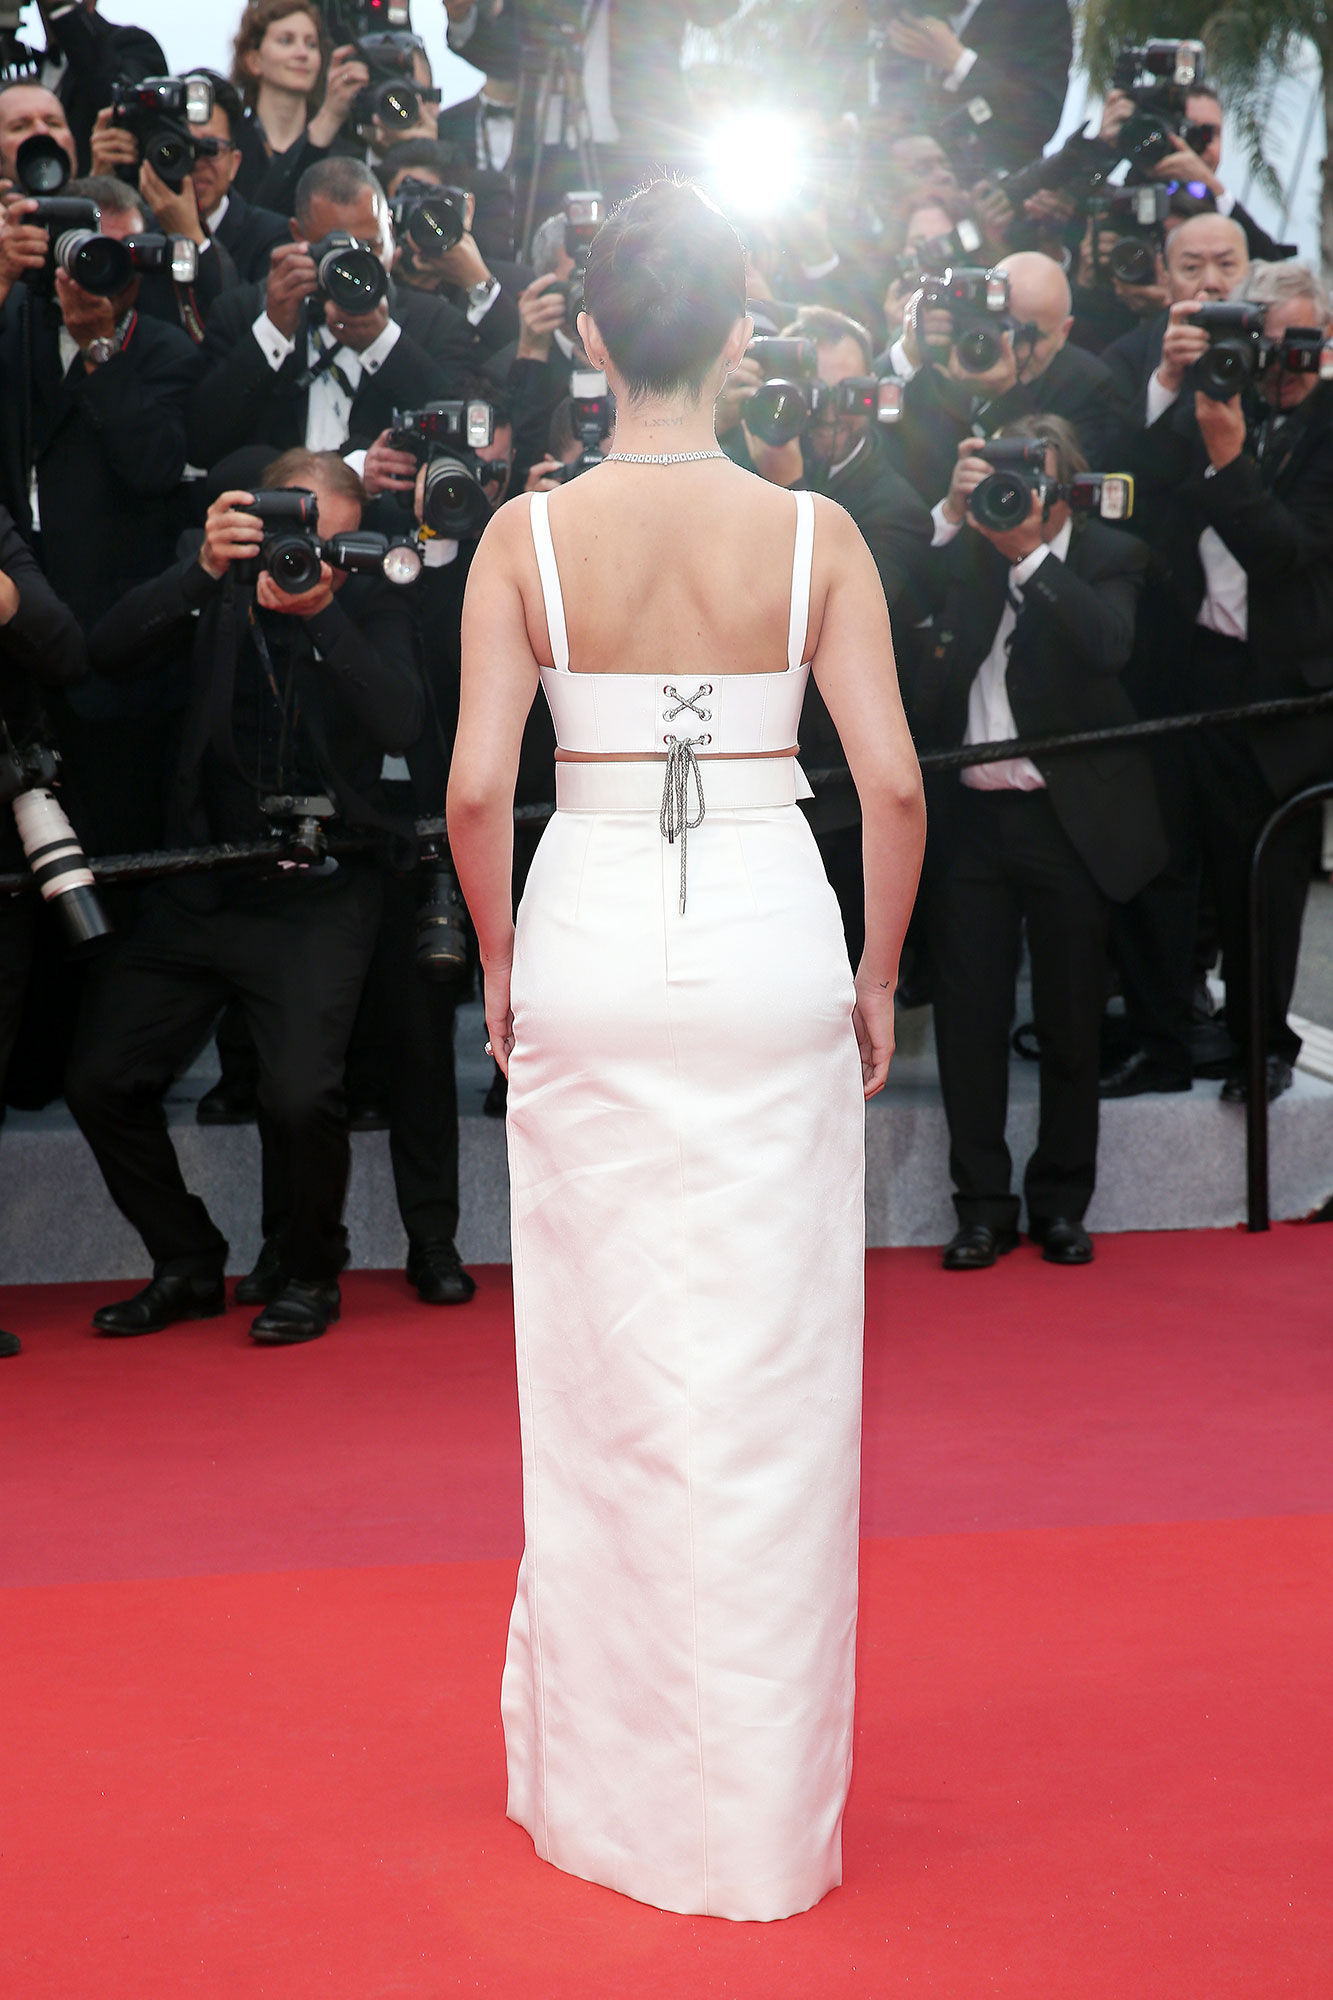 Selena Gomez Cannes - Hairstylist Marissa Marino created a clean braided bun to keep the brunette beauty's hair sleek and chic.